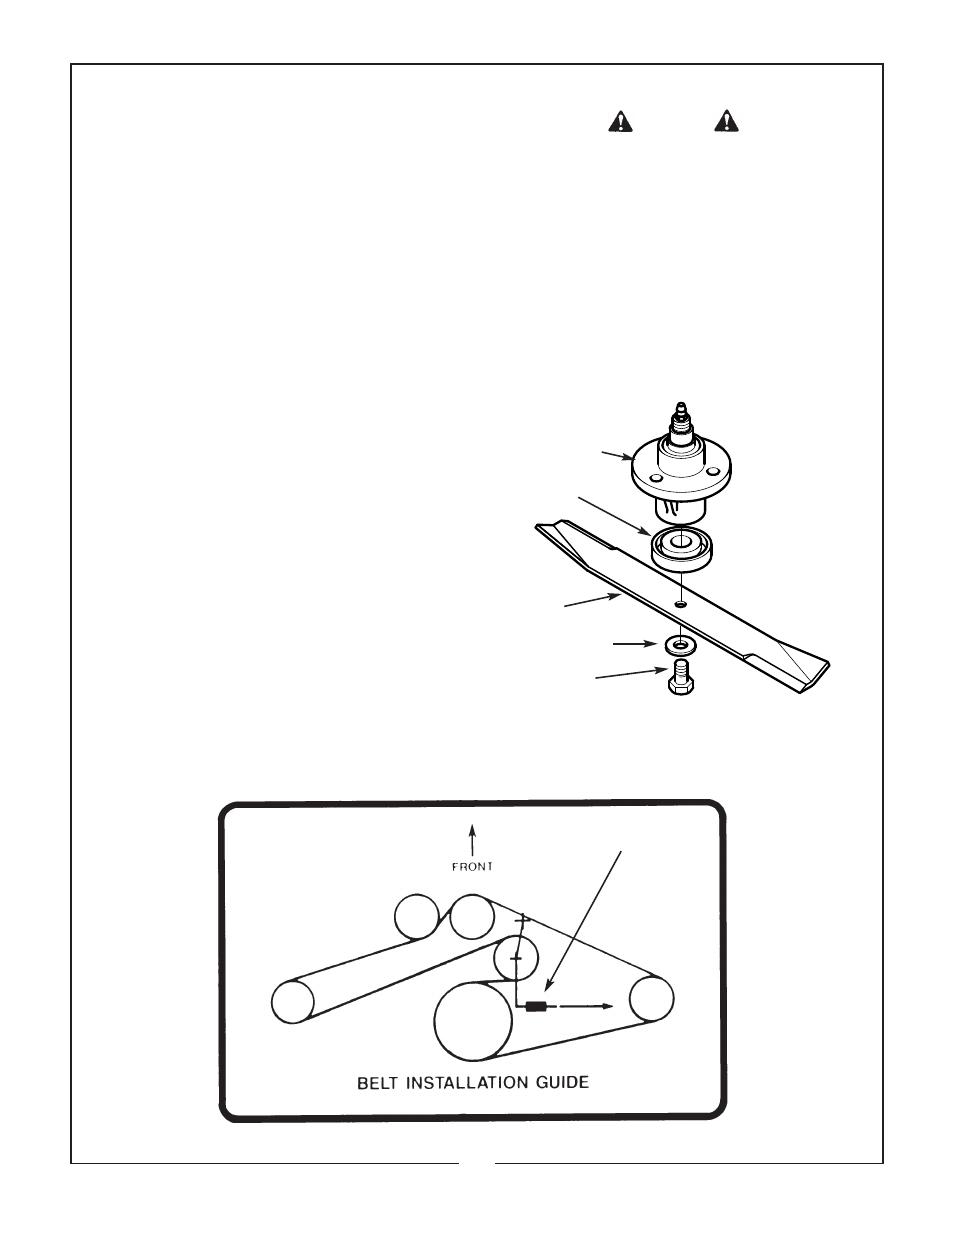 27 Bush Hog Parts Diagram